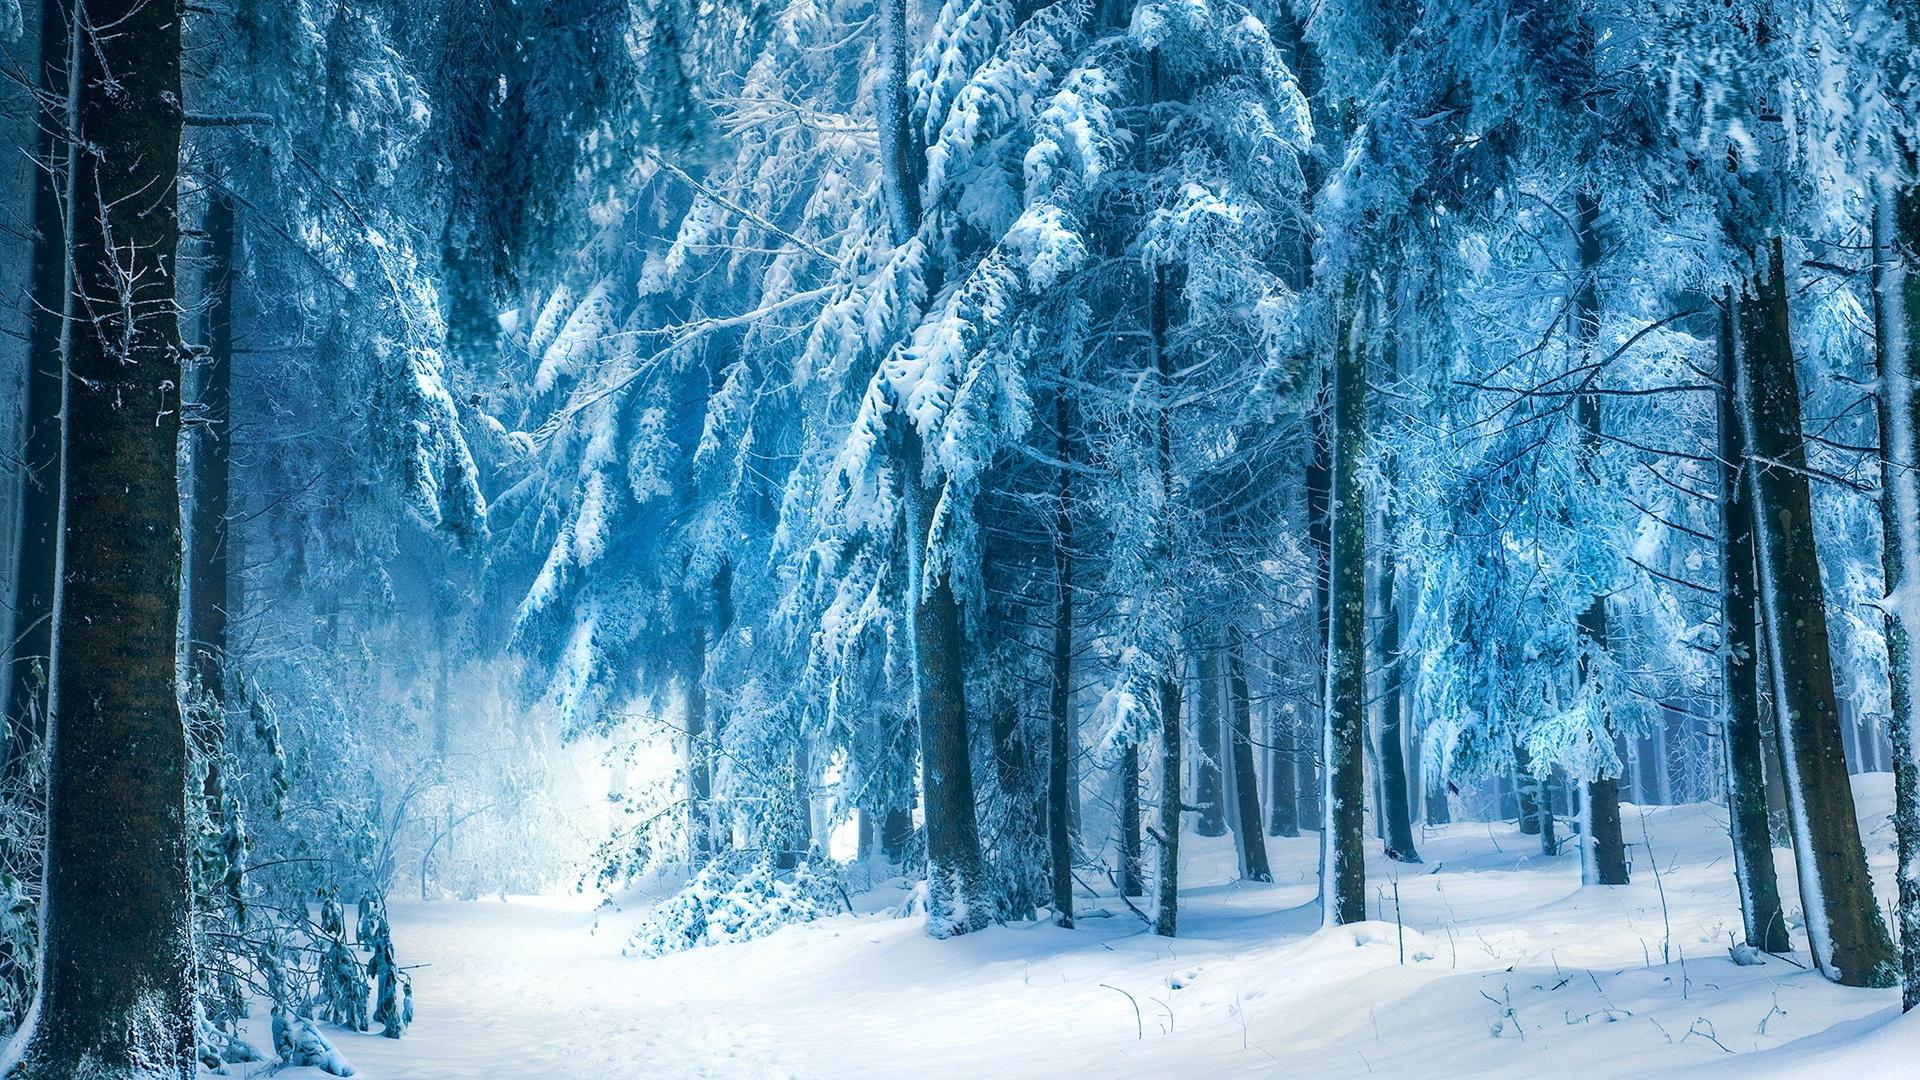 Landscape tree nature beautiful snow winter christmas f 1920x1080